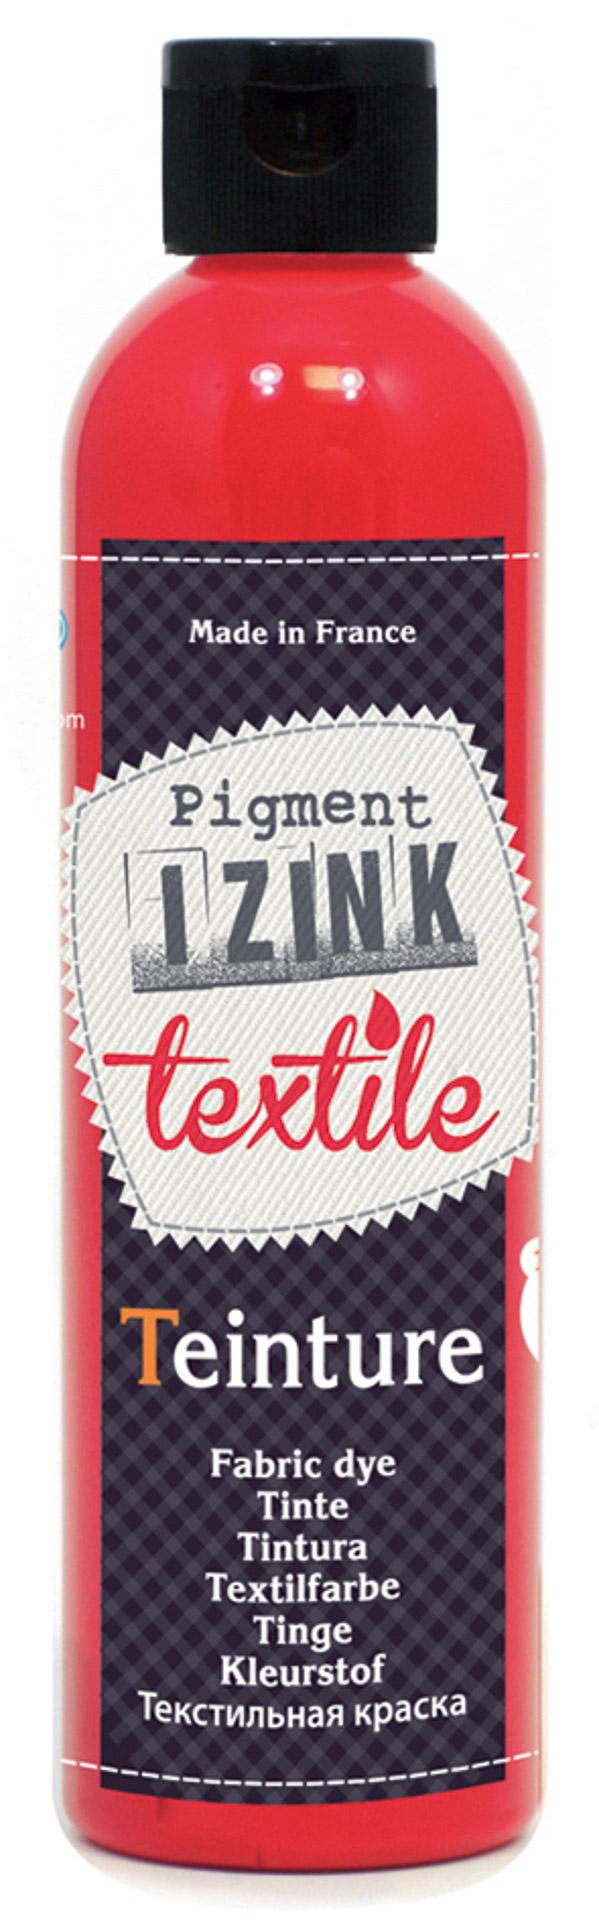 teinture textile aladine rouge santal 180ml 3b com. Black Bedroom Furniture Sets. Home Design Ideas